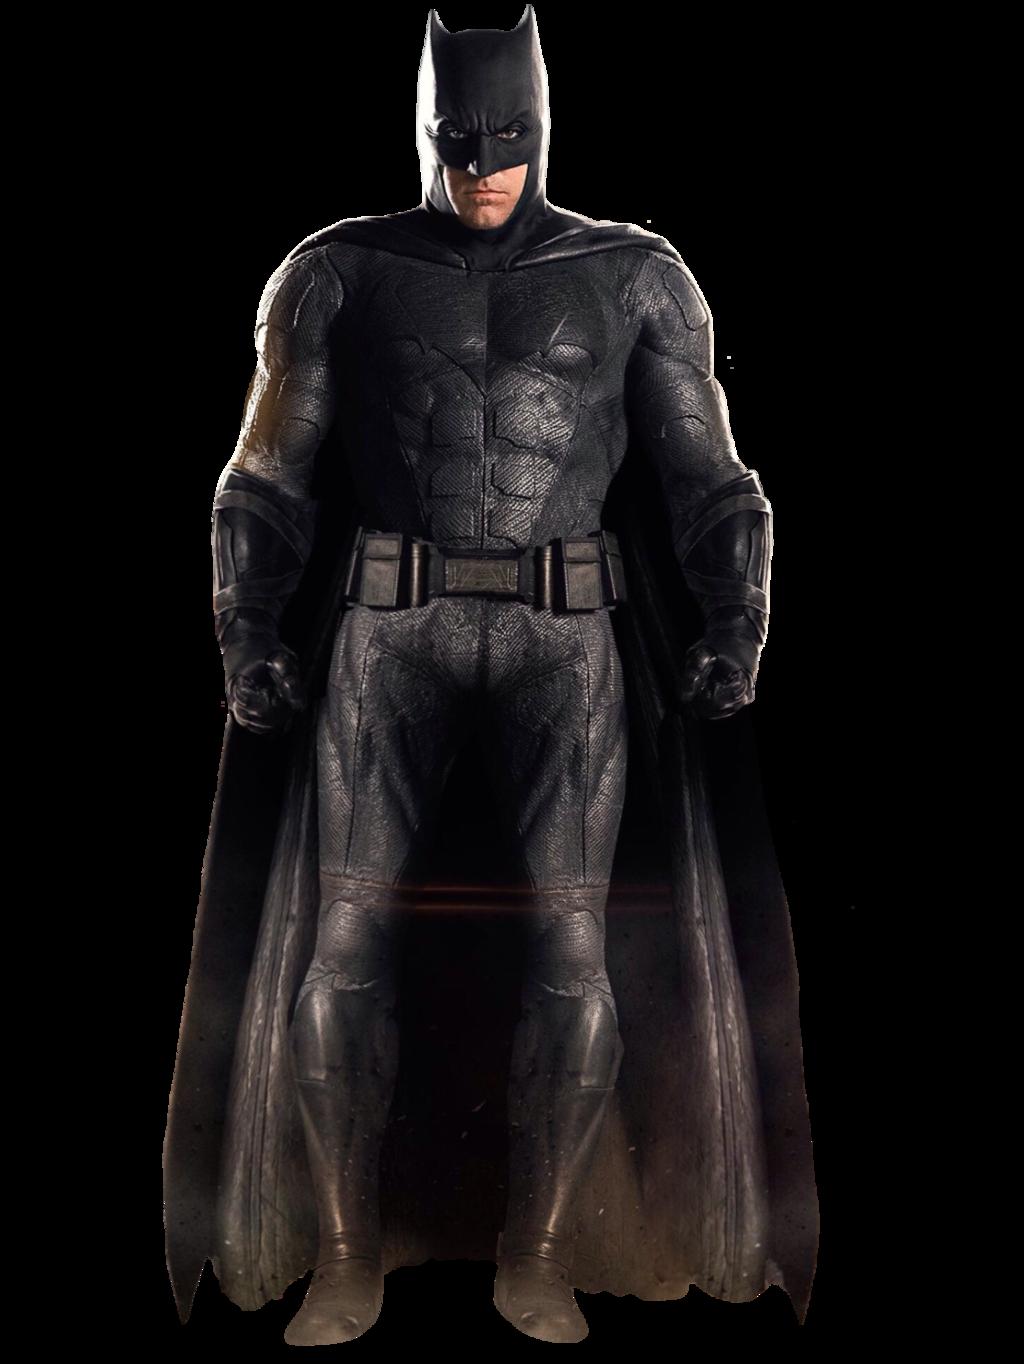 Batman Justice League Png Image Batman Justice League Cyborg Justice League